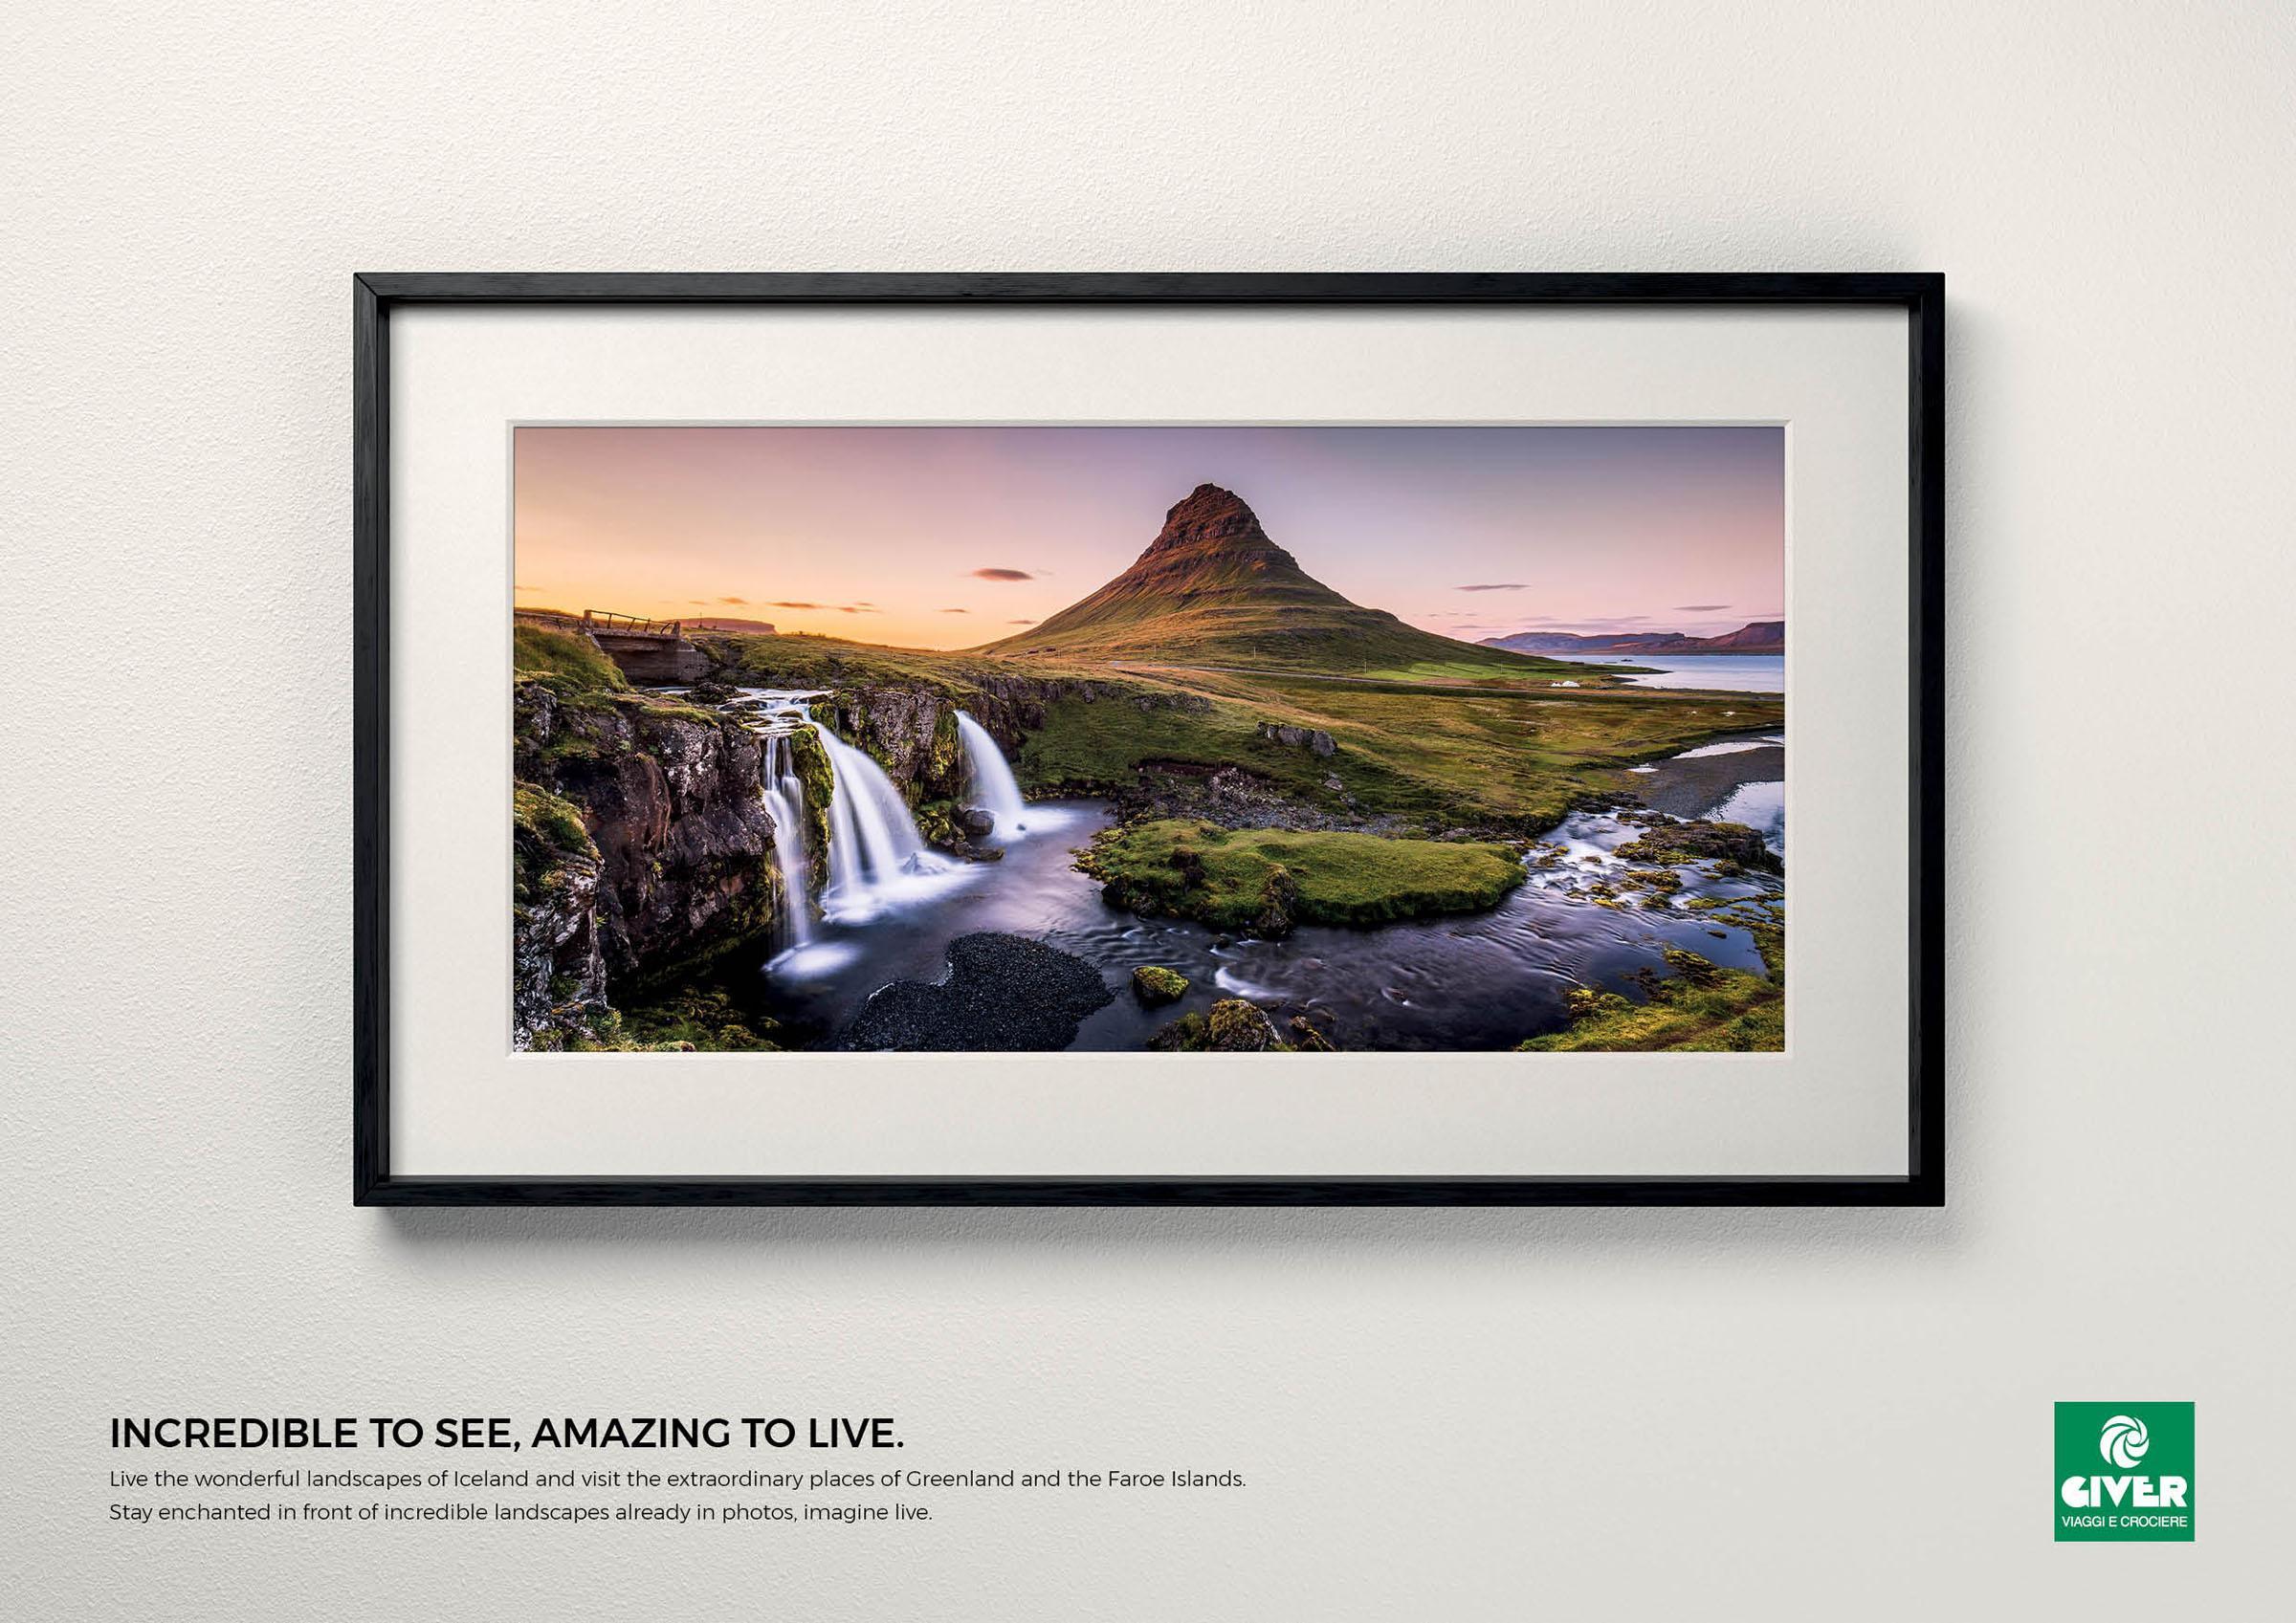 Giver Viaggi Print Ad - Travel Masterpiece, Iceland